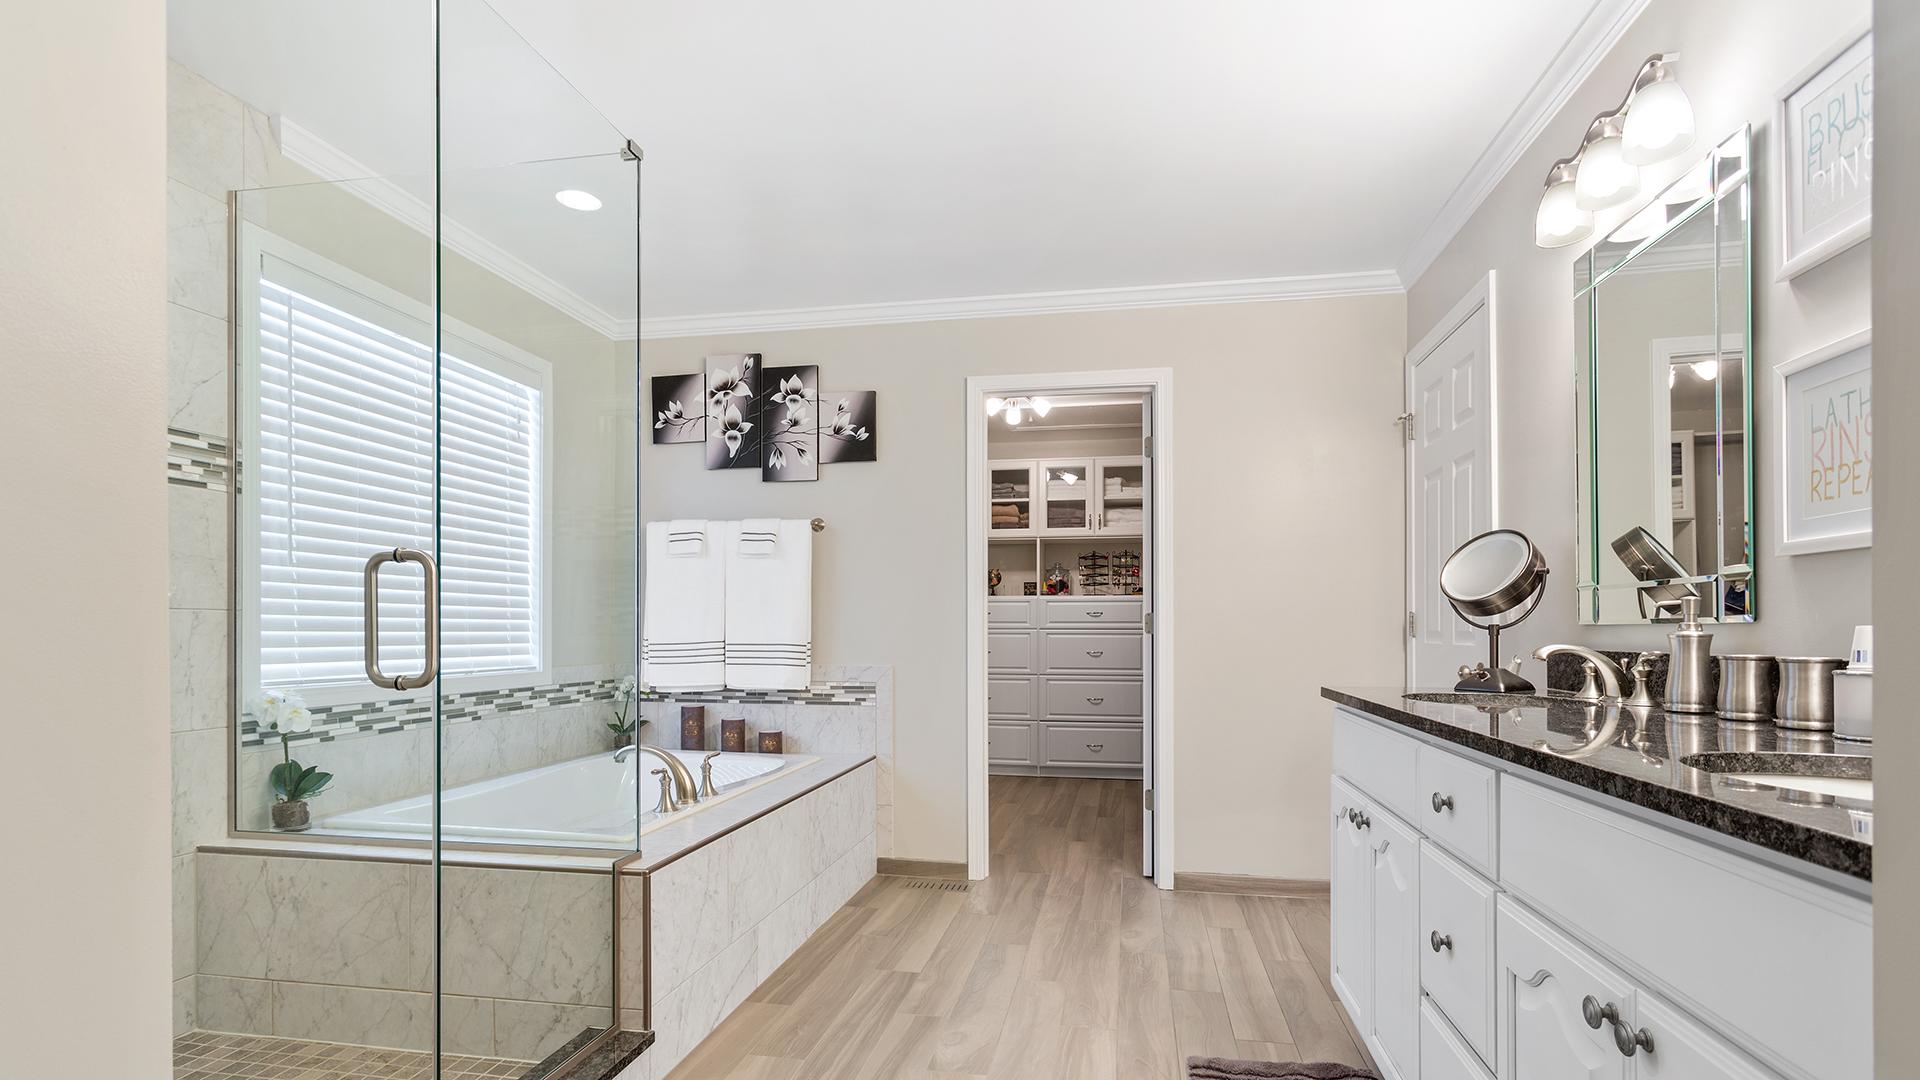 Kitchen Bathroom Remodeling Naperville J J Construction Of Illinois Inc